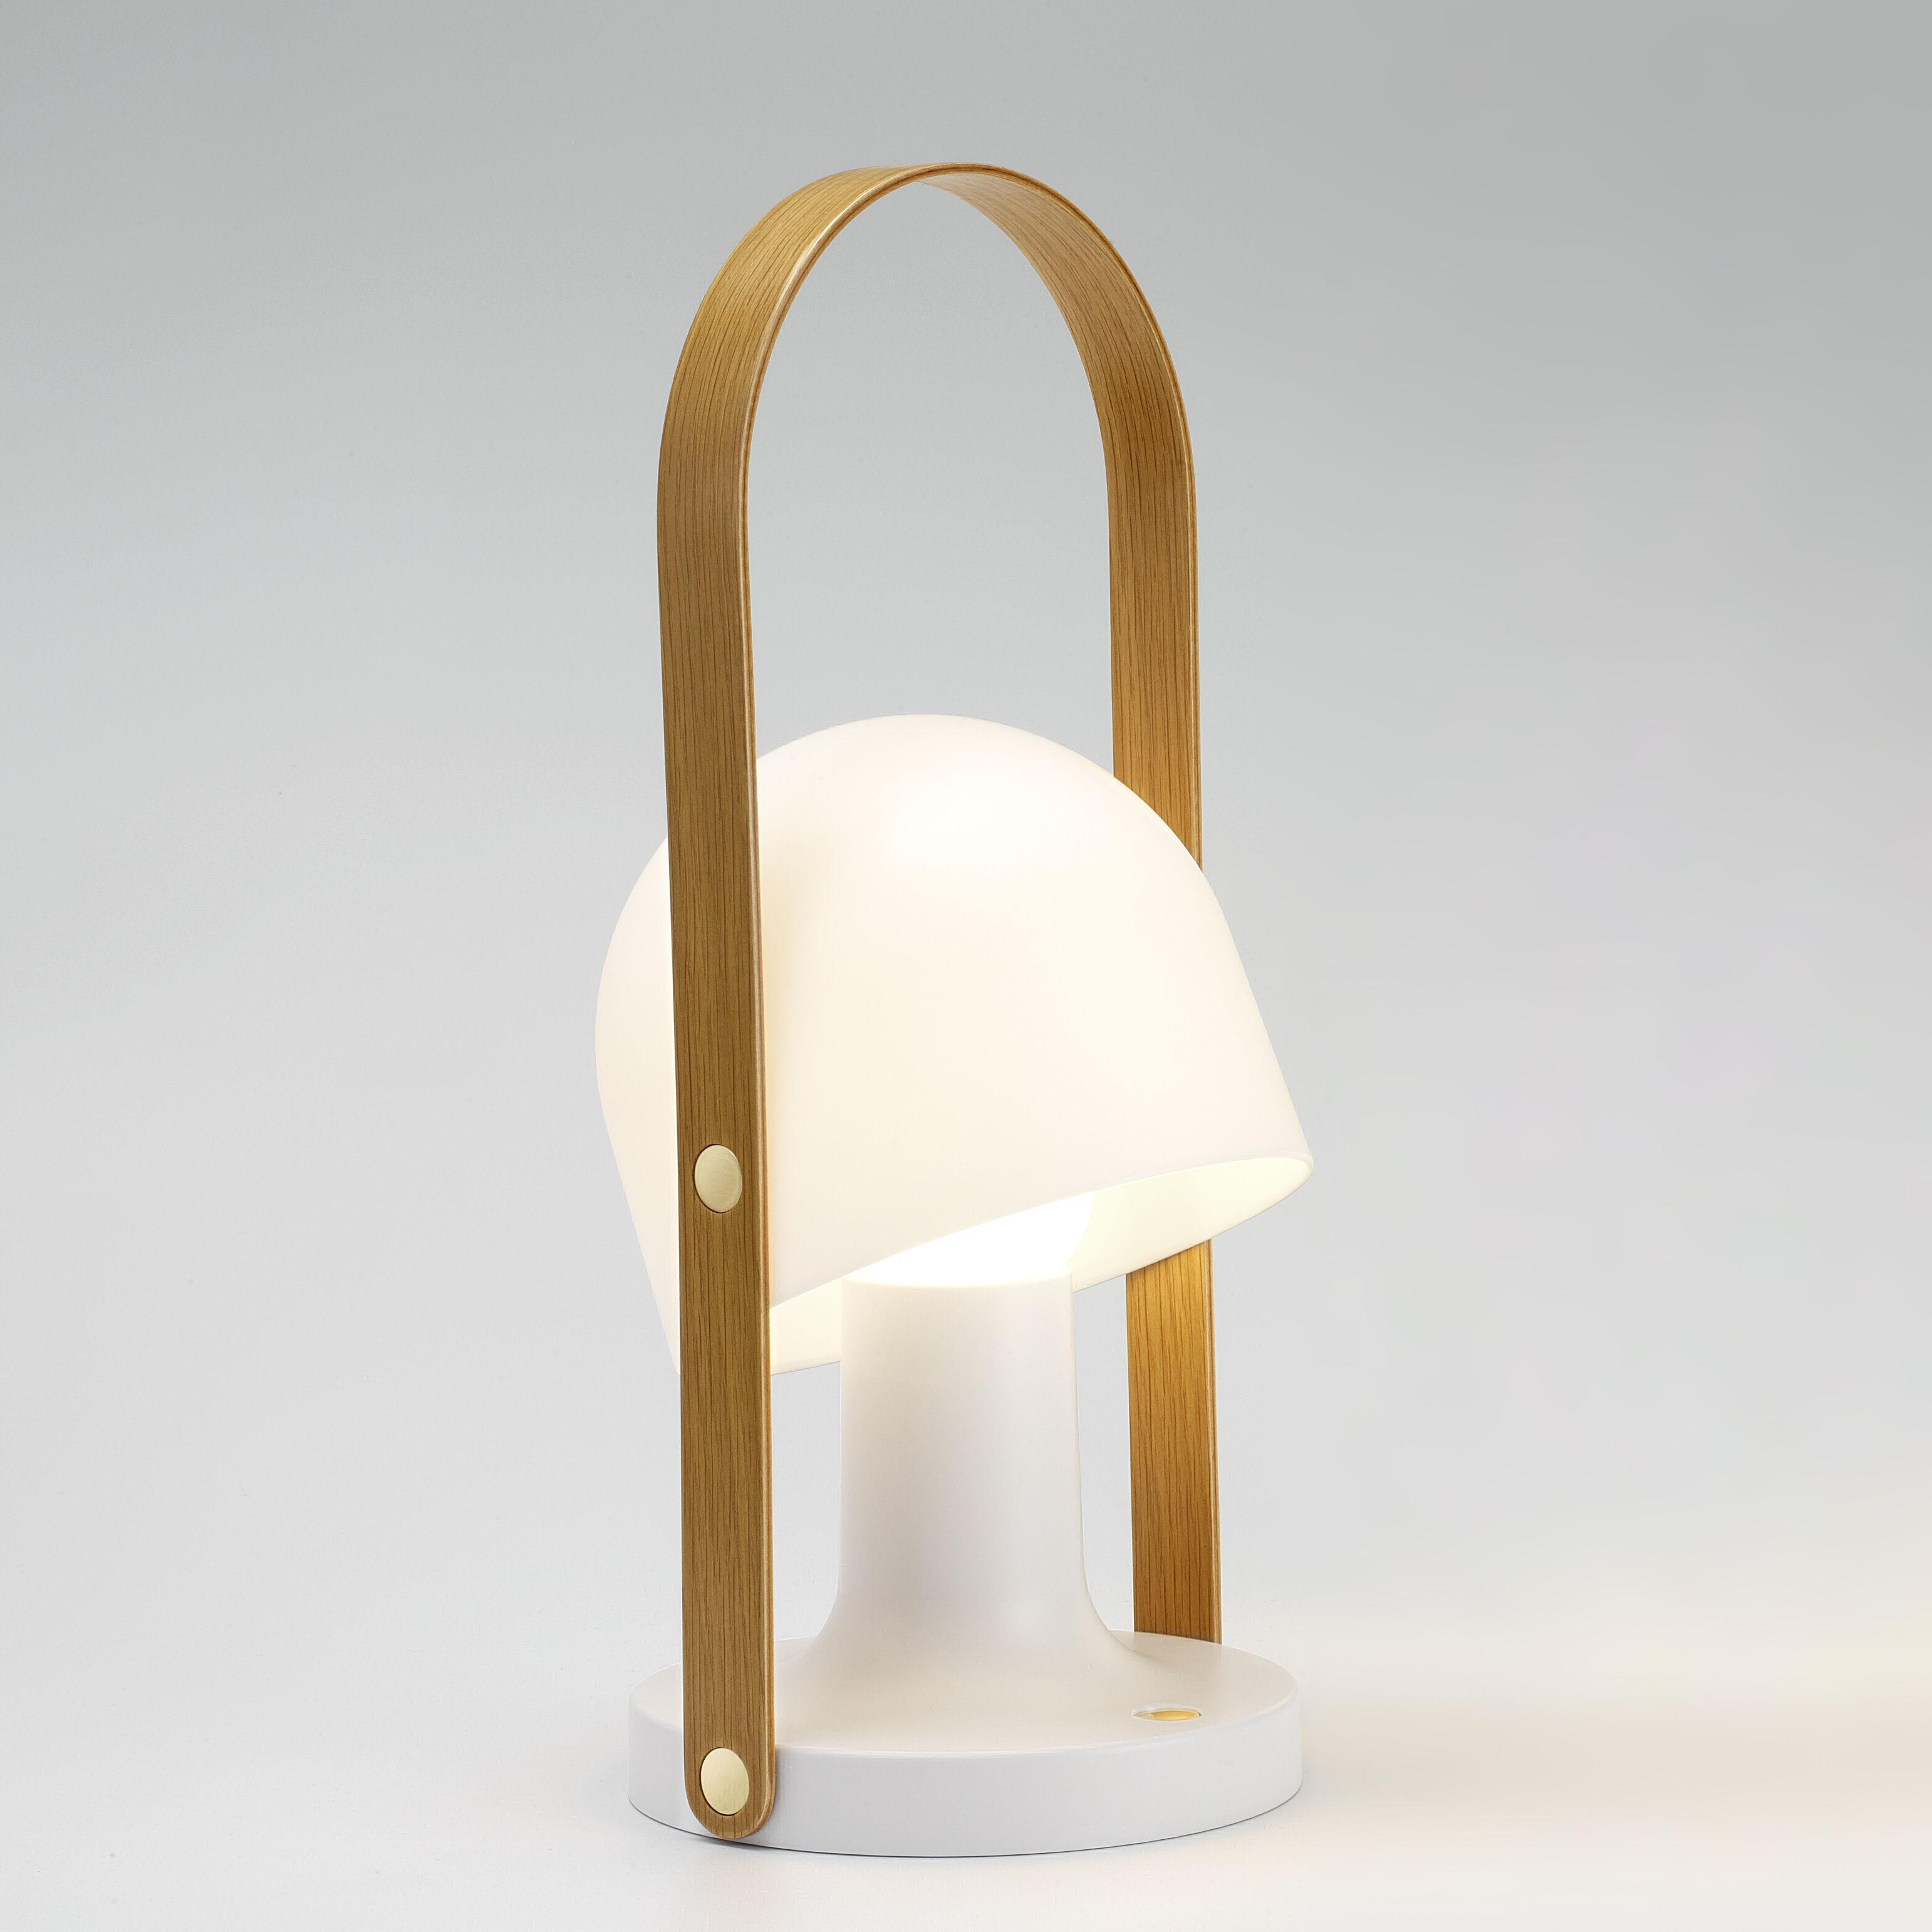 Lighting - Table Lamps - FollowMe Plus Wireless lamp - / LED - H 44 cm by Marset - H 44 cm / White & wood - Oak plywood, Polycarbonate